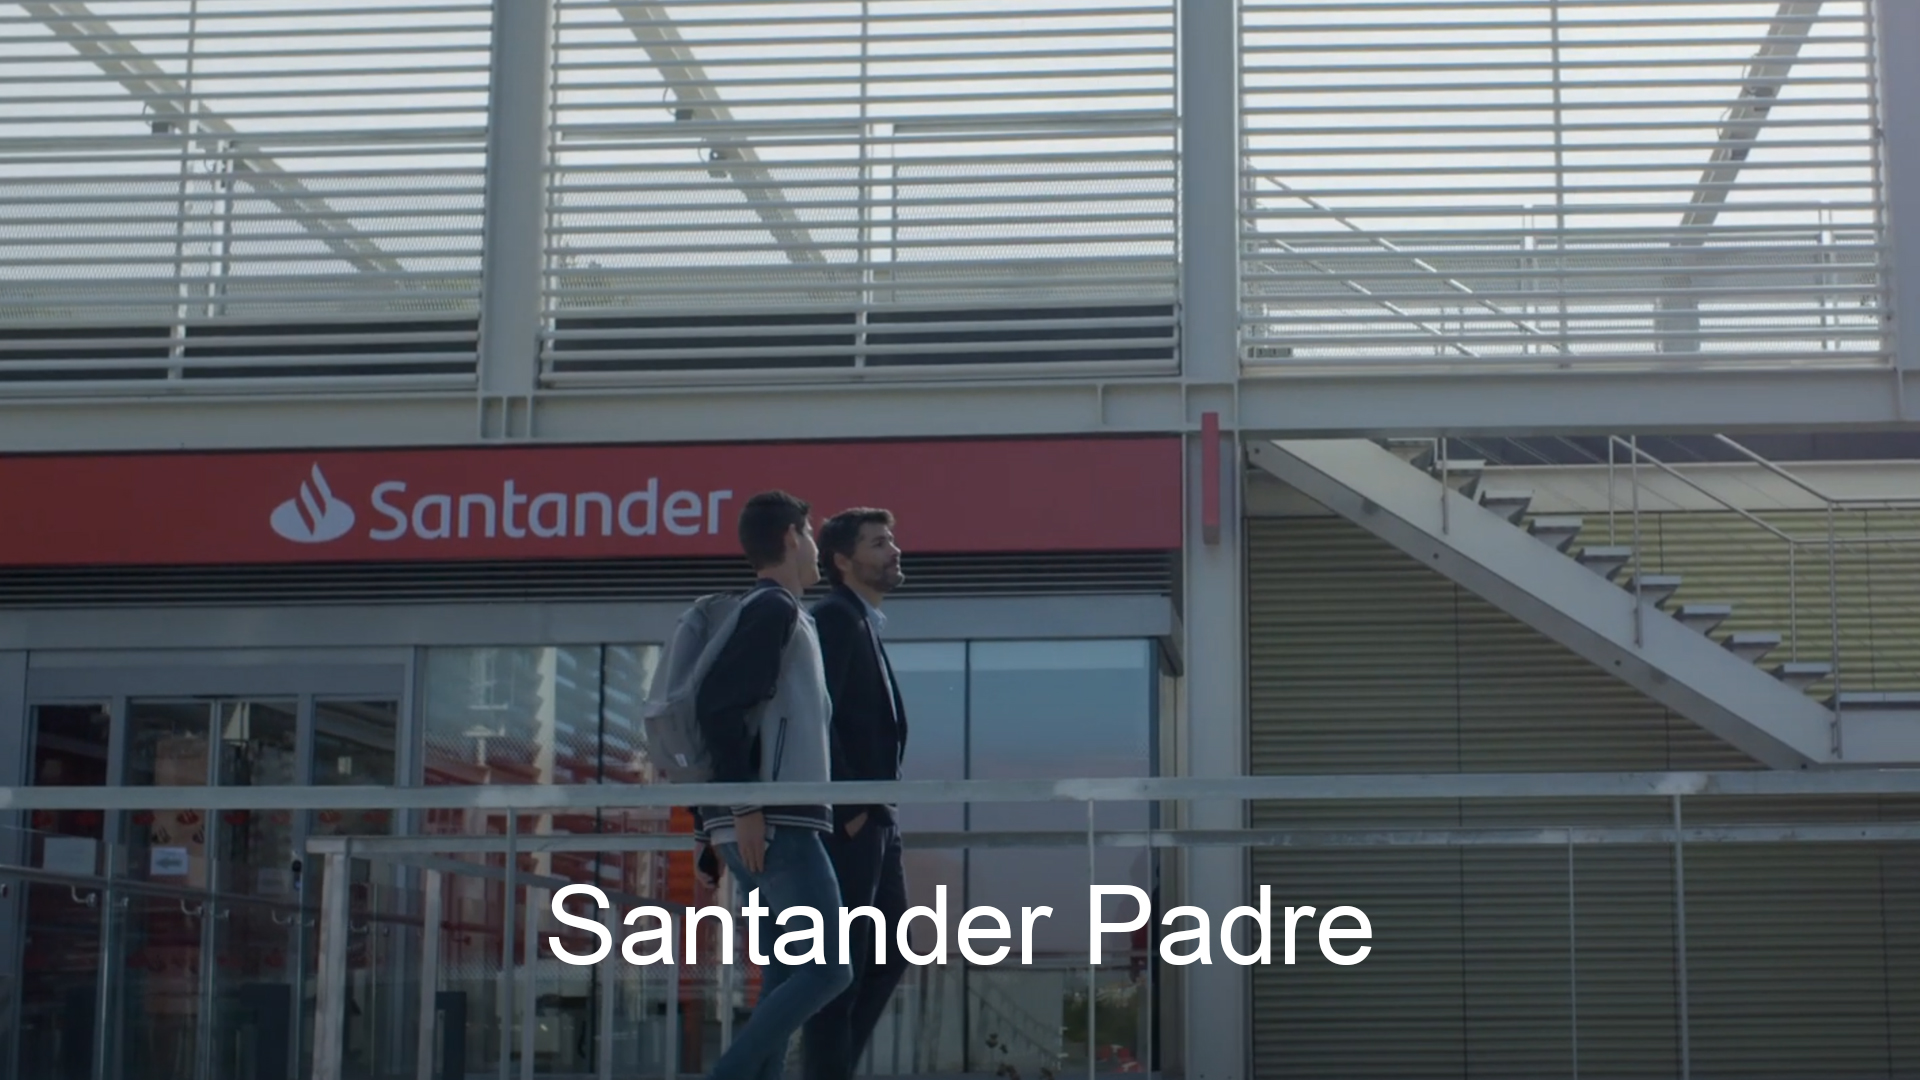 Spot Santander Padre